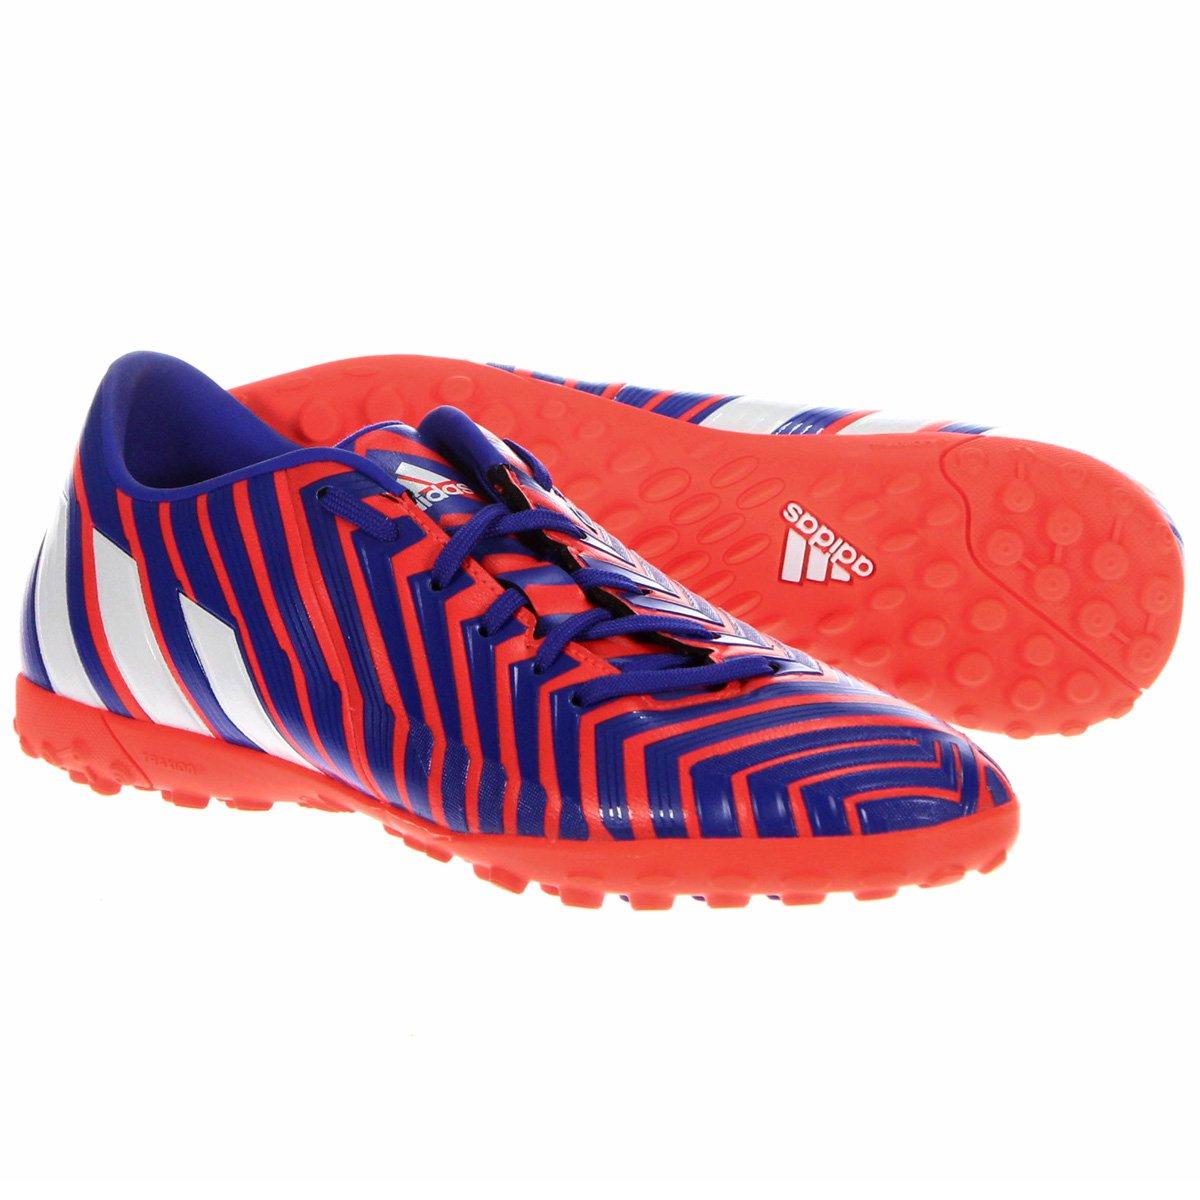 dffe828810536 Chuteira Adidas Absolado Instinct TF Society - Compre Agora